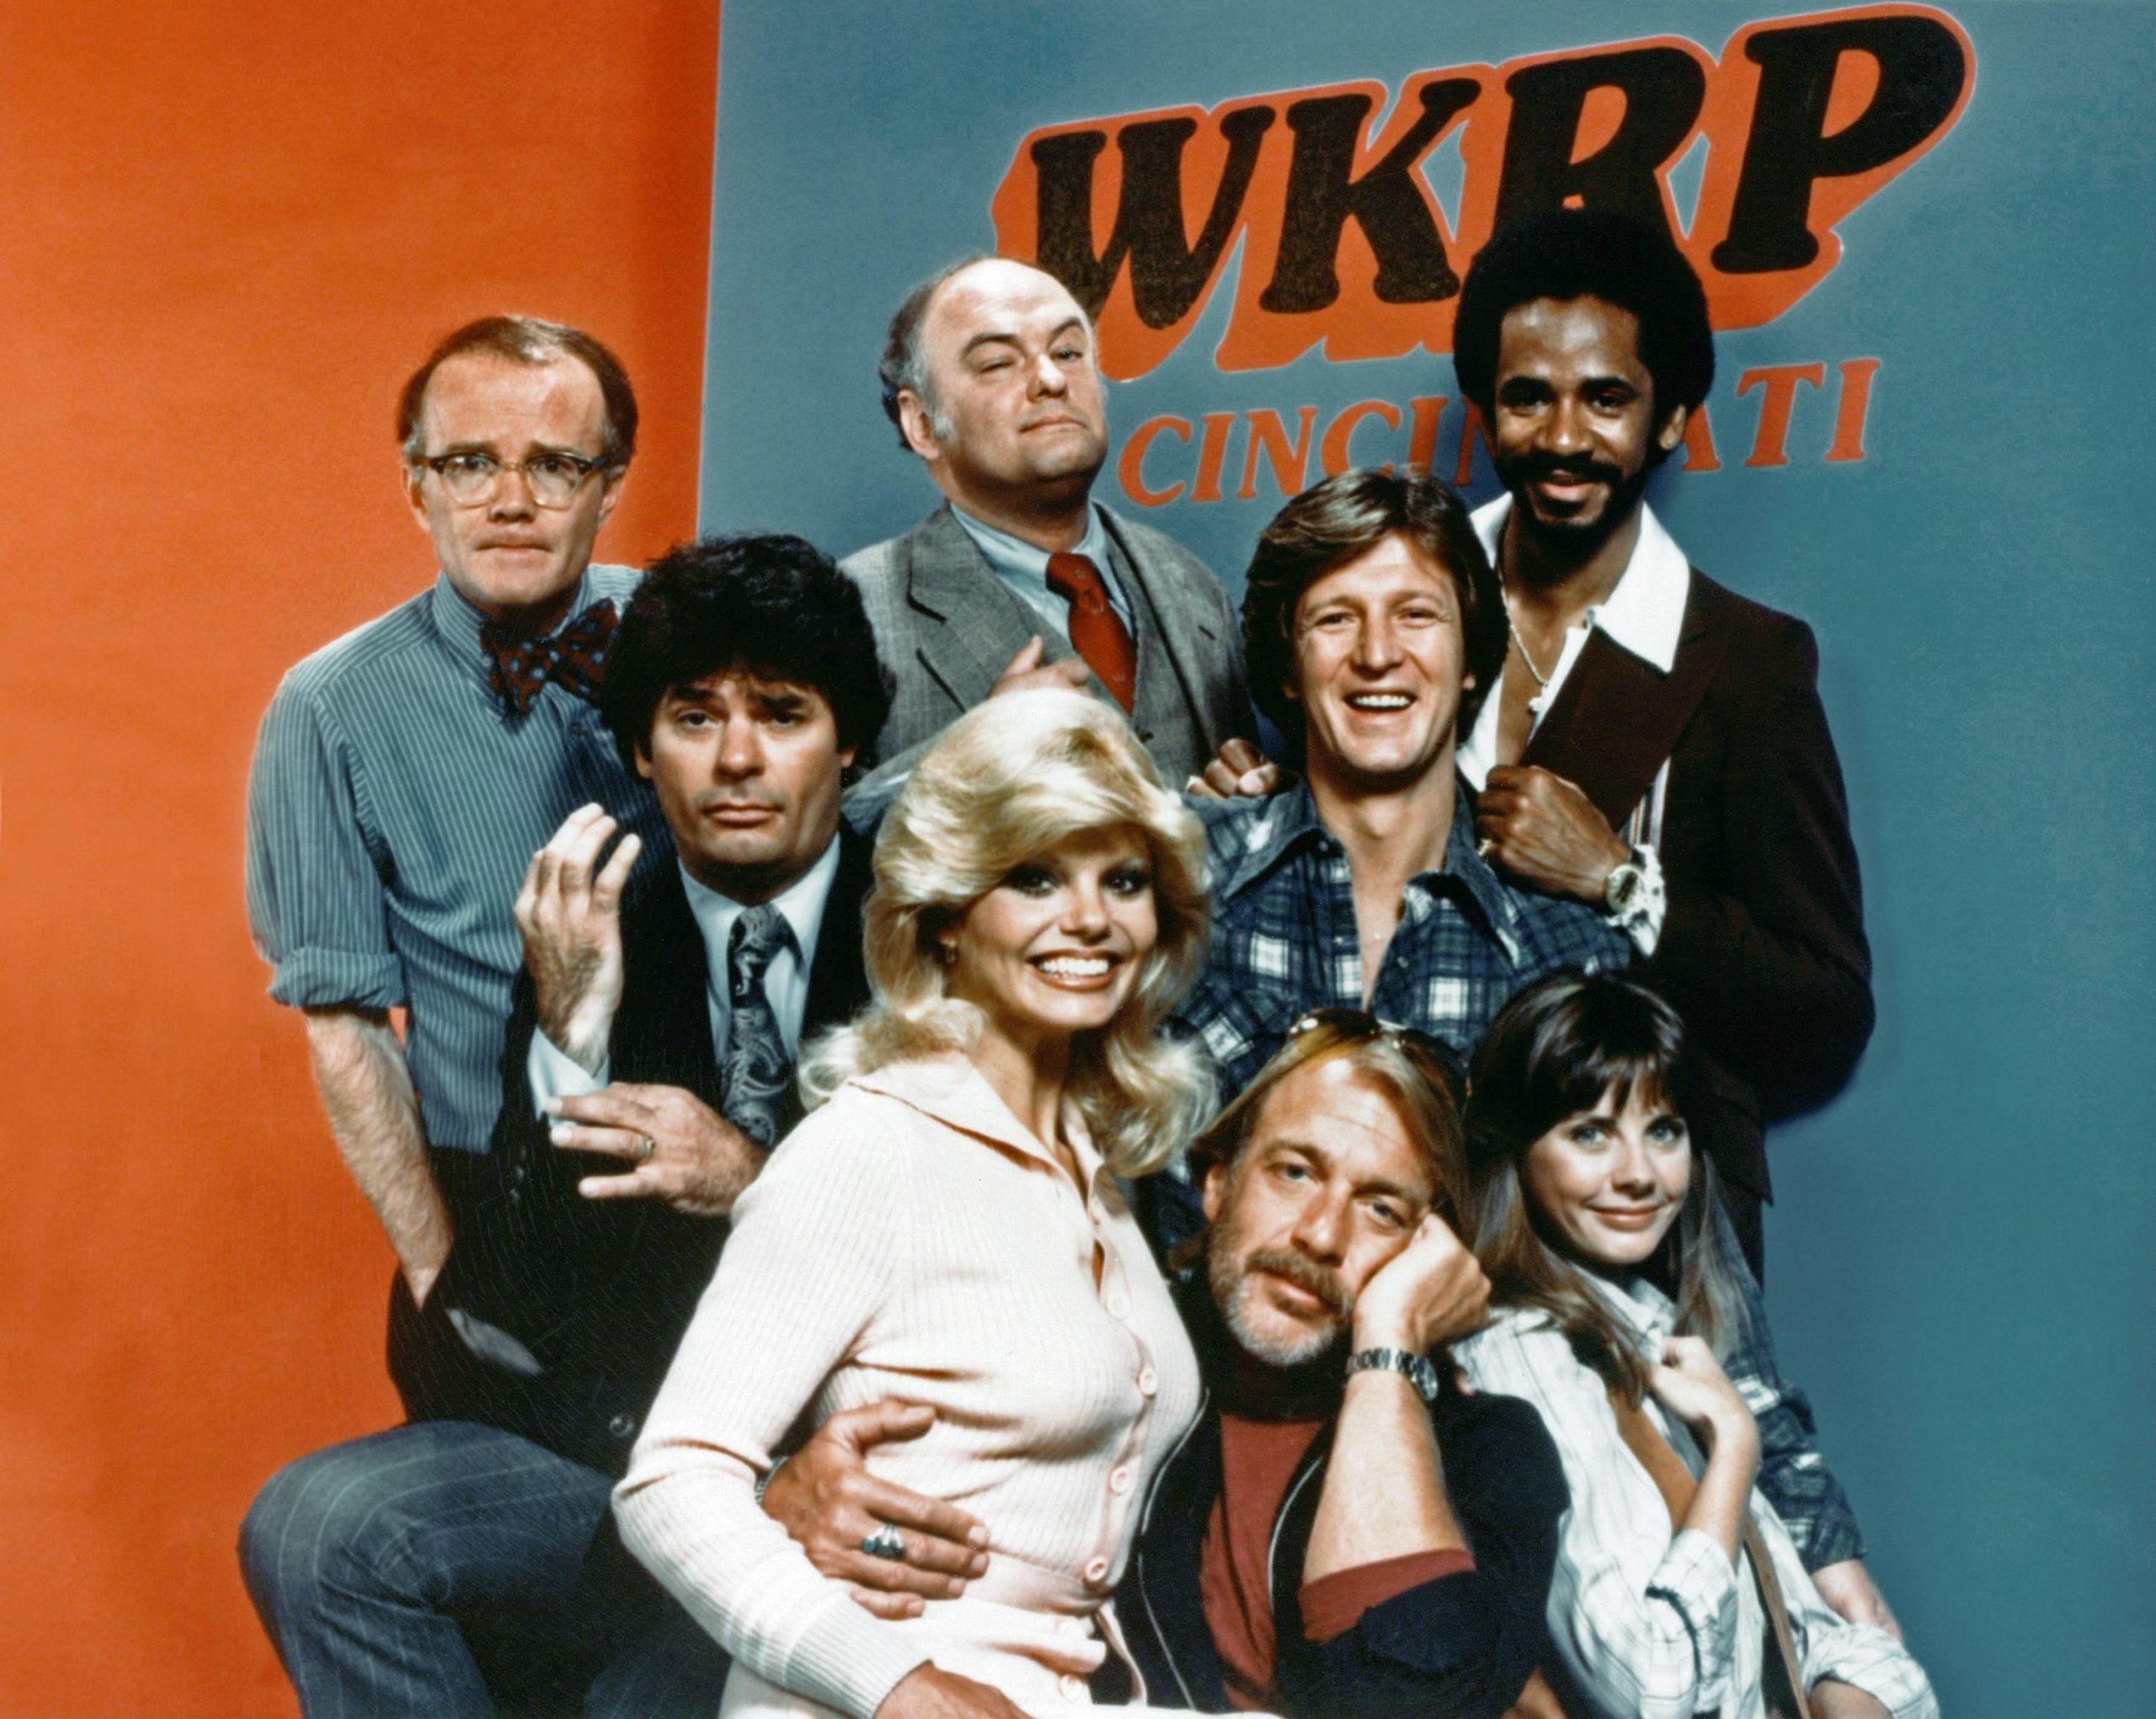 Meet the staff of WKRP in Cincinnati